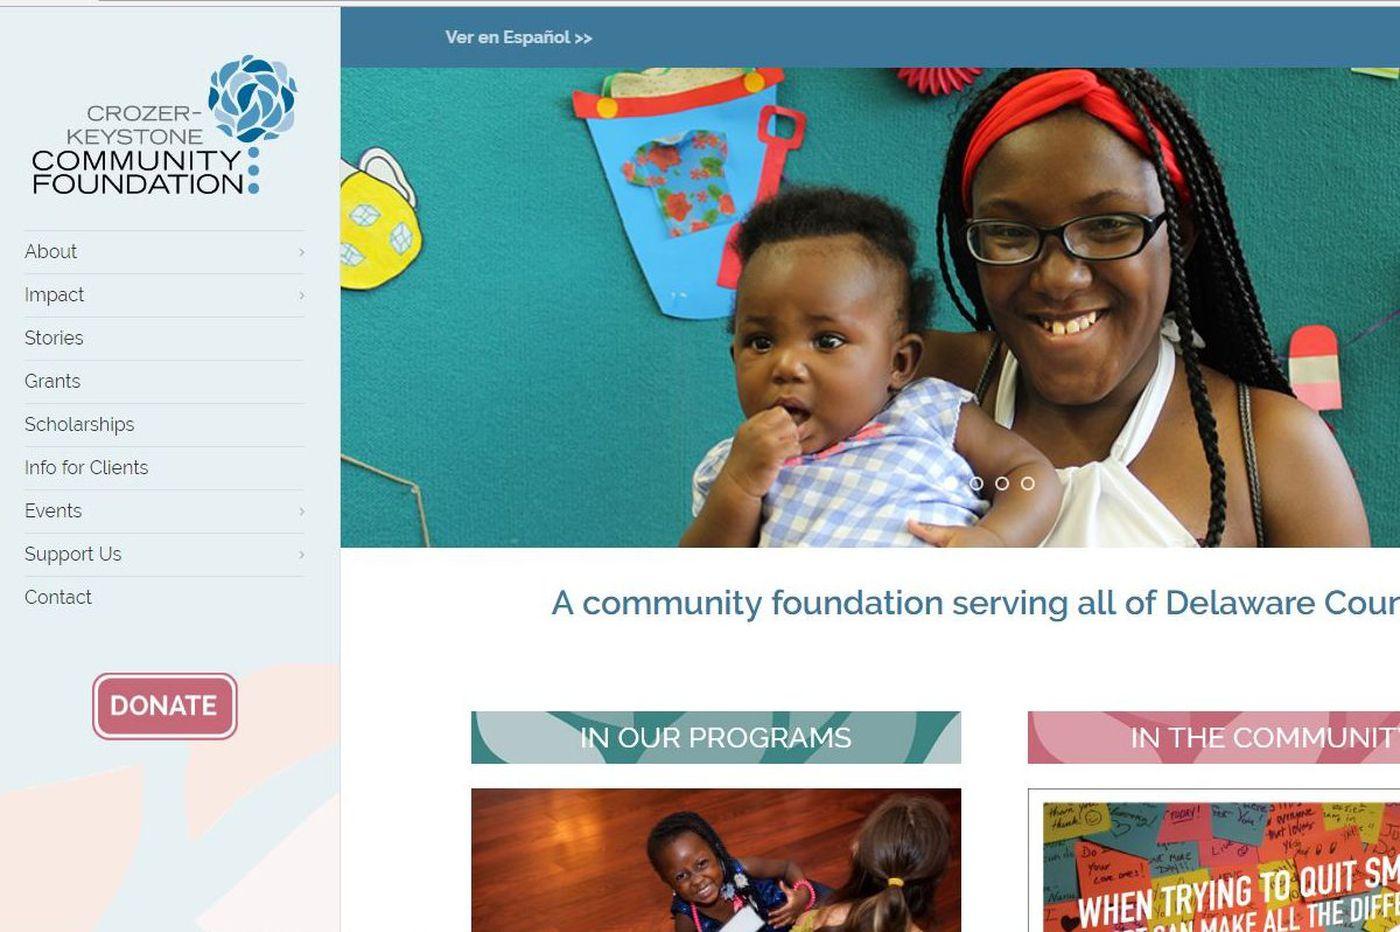 Crozer-Keystone Community Foundation wins arbitrator decision against Prospect Medical